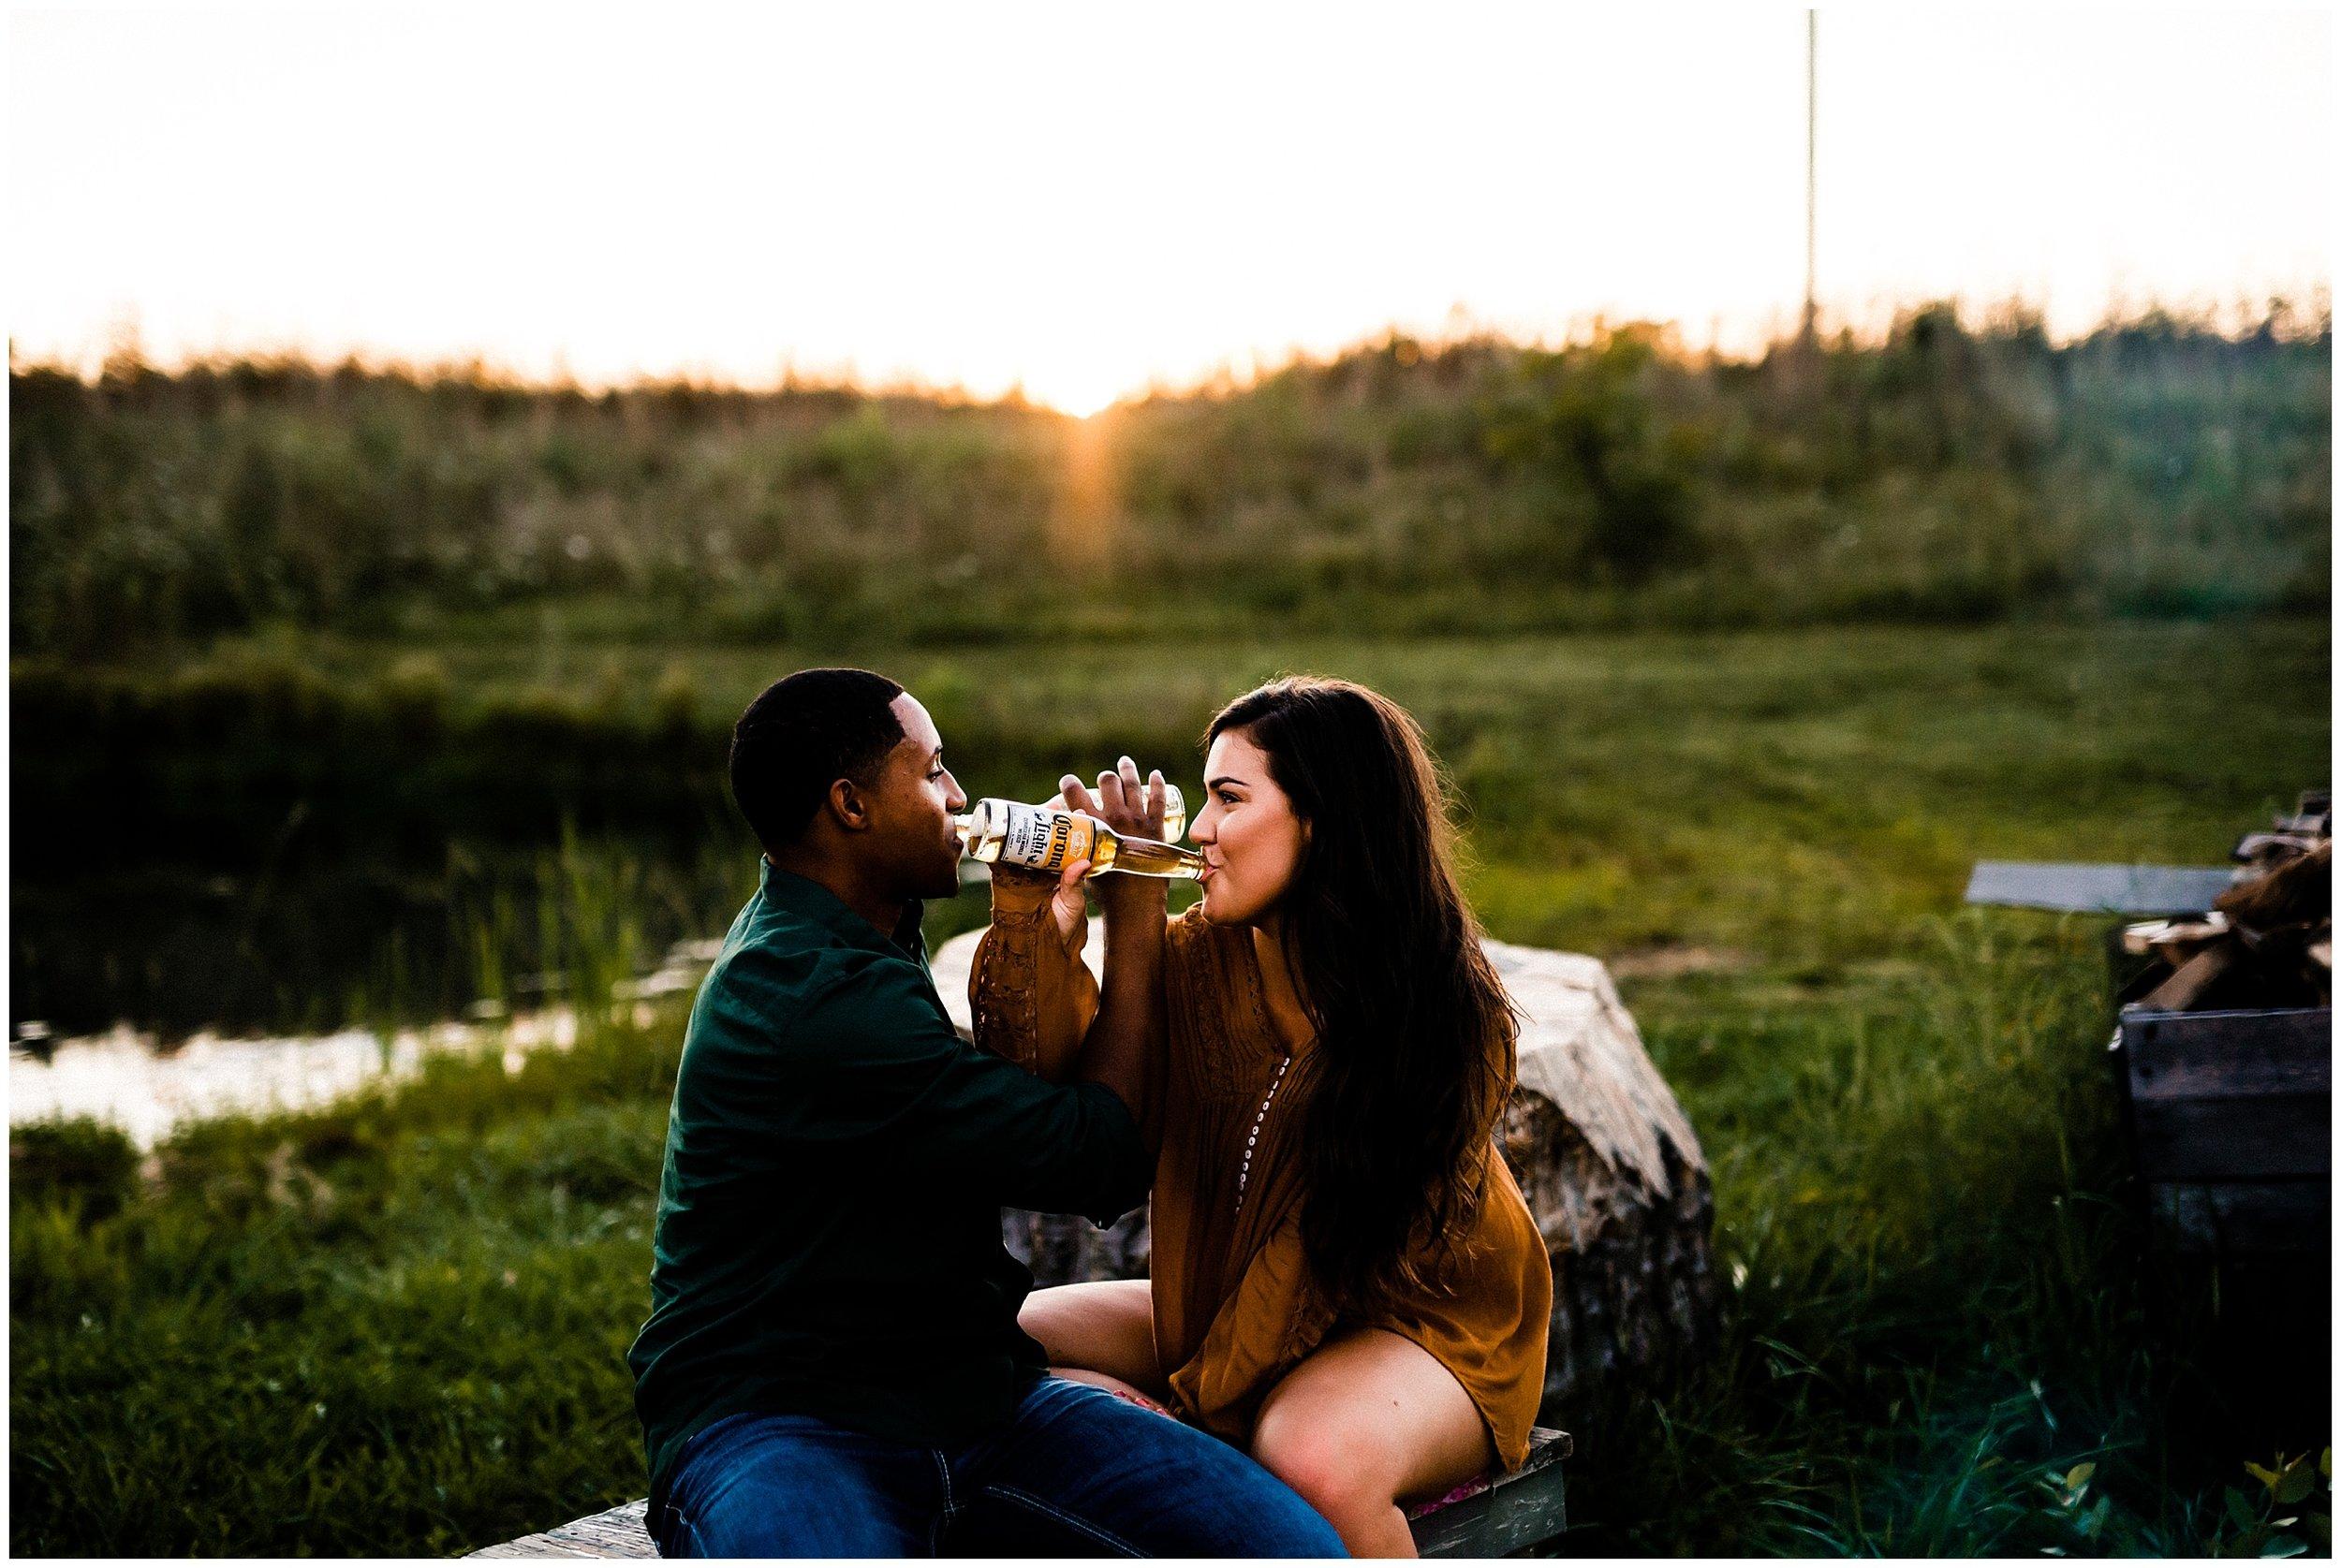 Tabias + Zabrea | Engaged  #kyleepaigephotography_0688.jpg